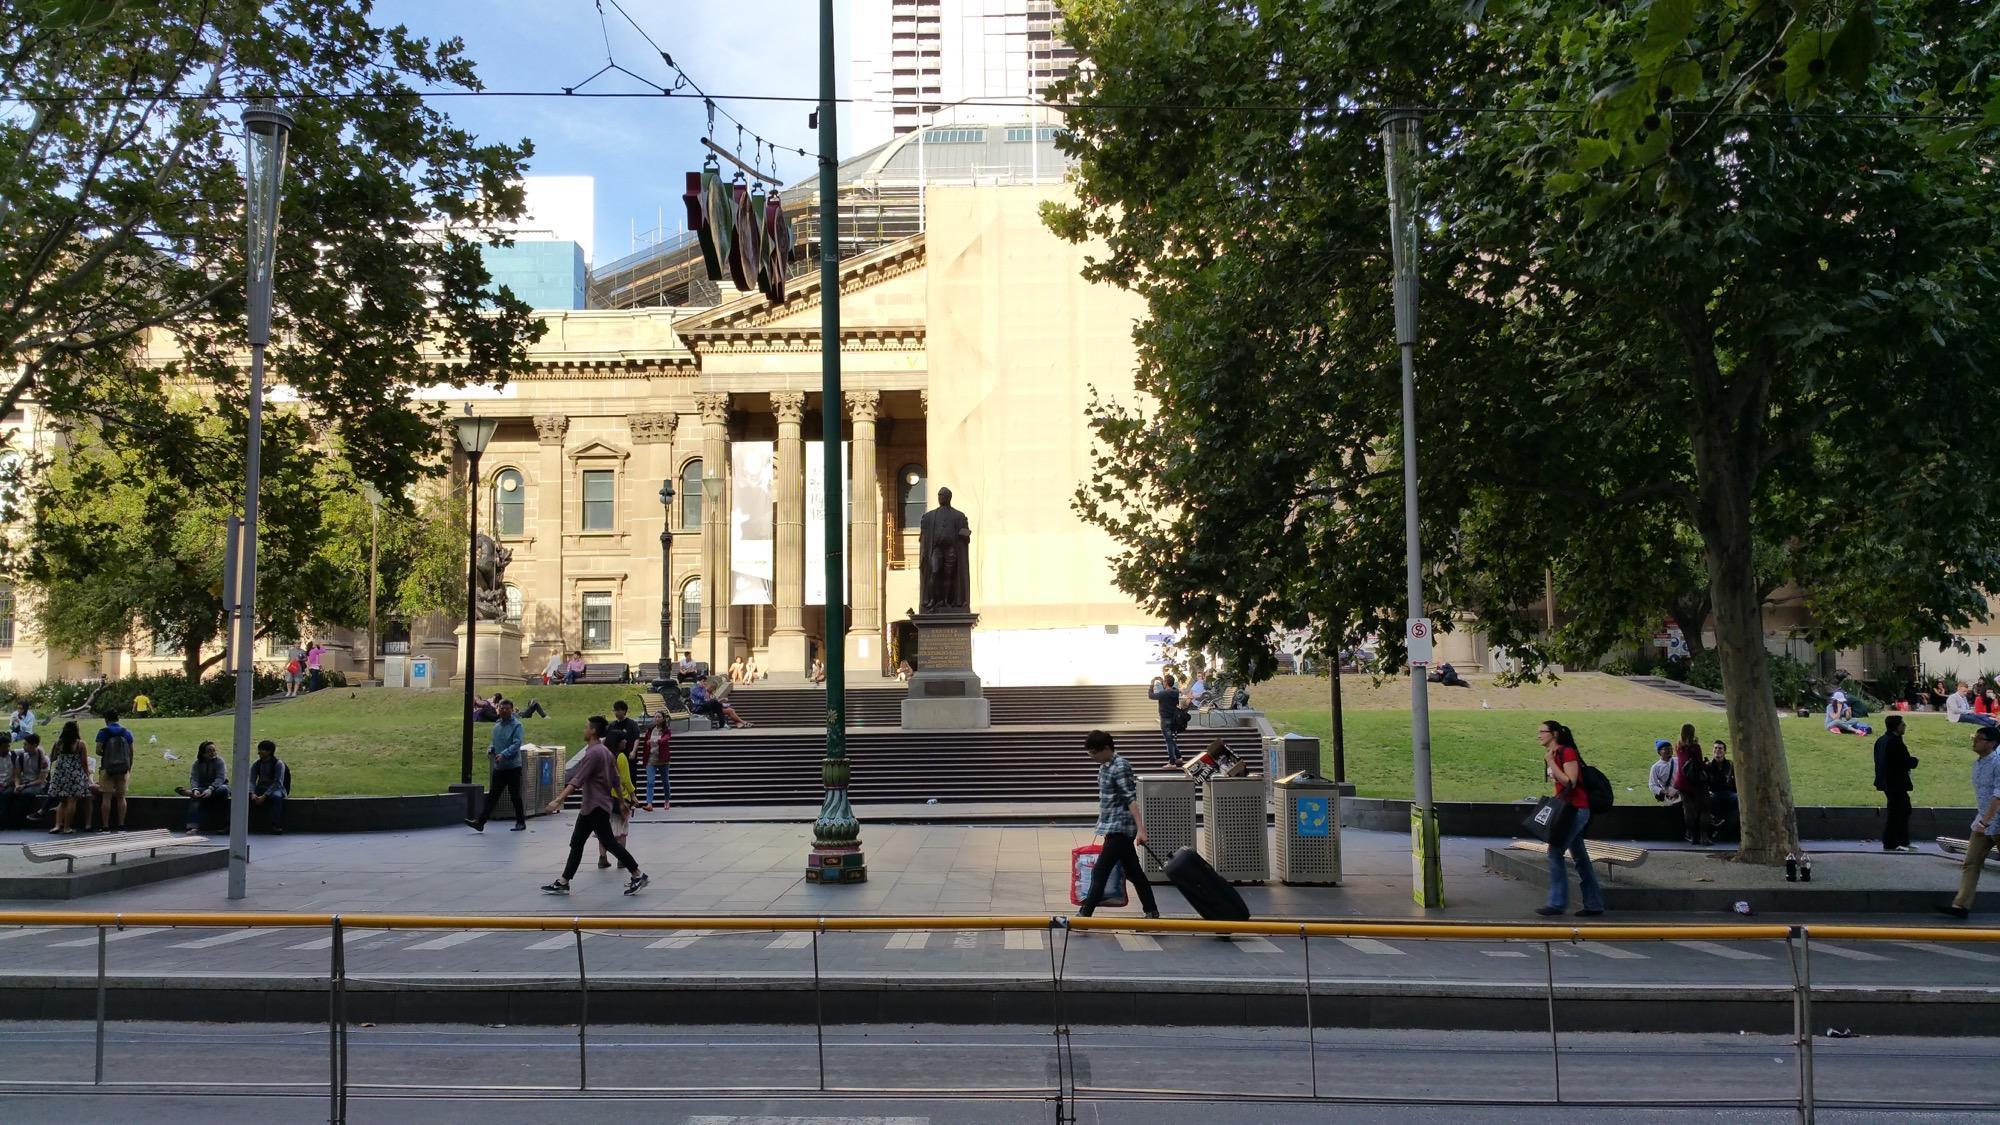 Melbourne stuff - 1 of 223 (86).jpg